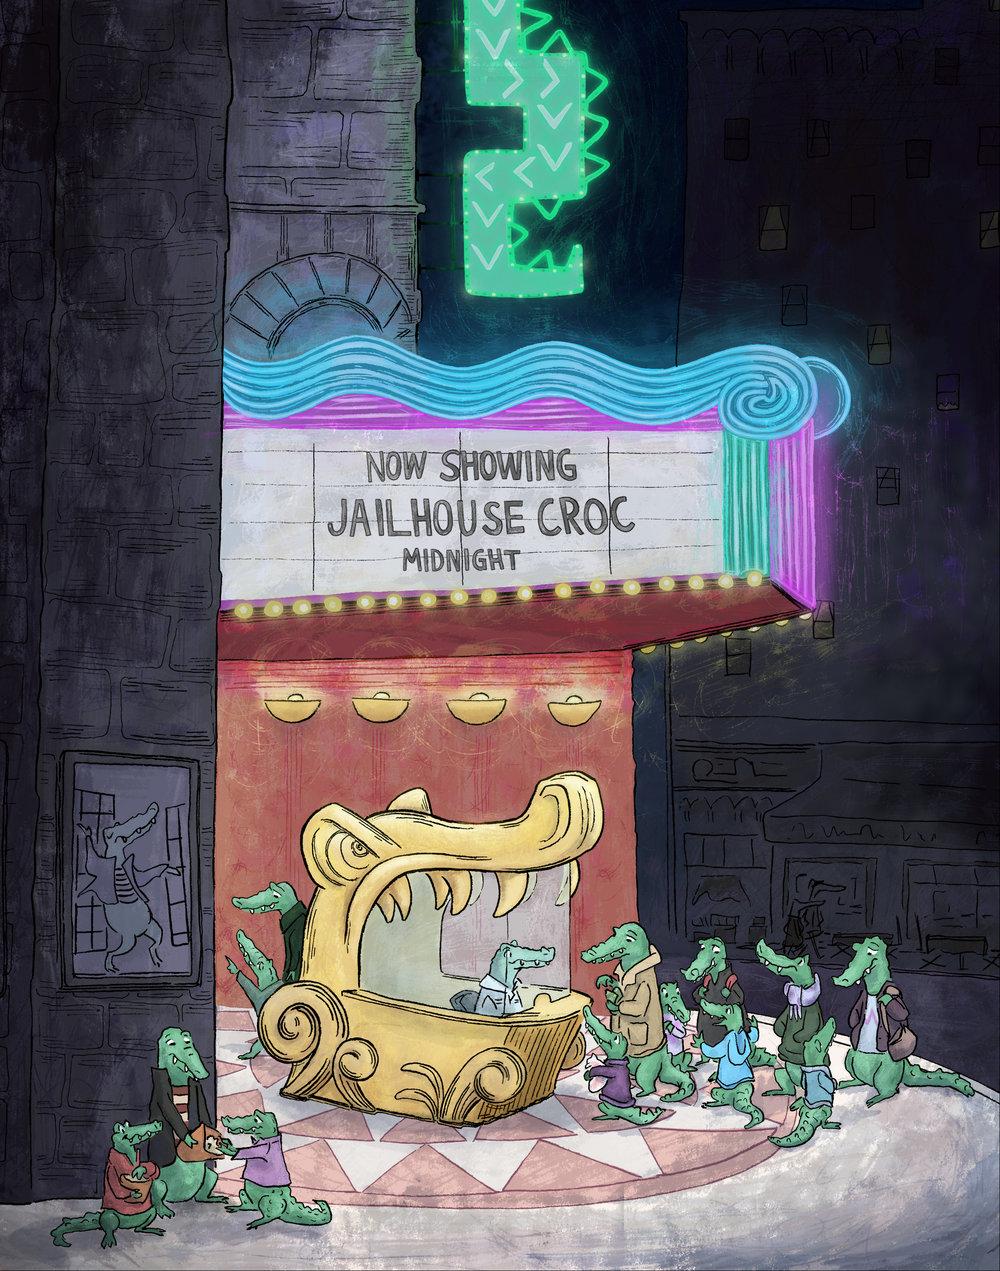 croctheater.jpg